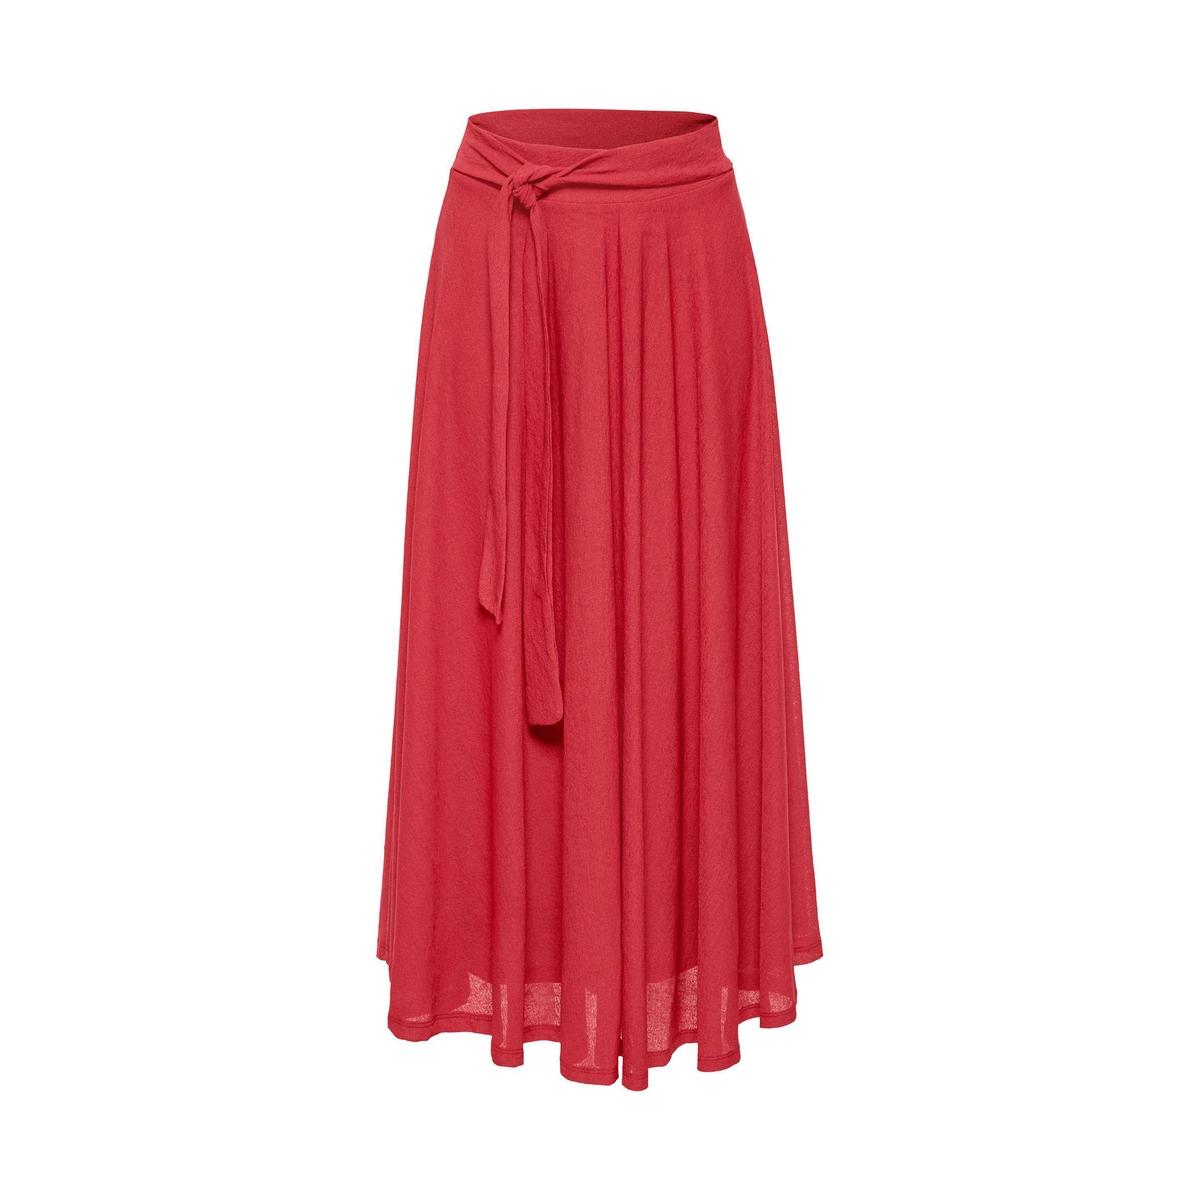 Falda midi vaporosa con cinturón para anudar